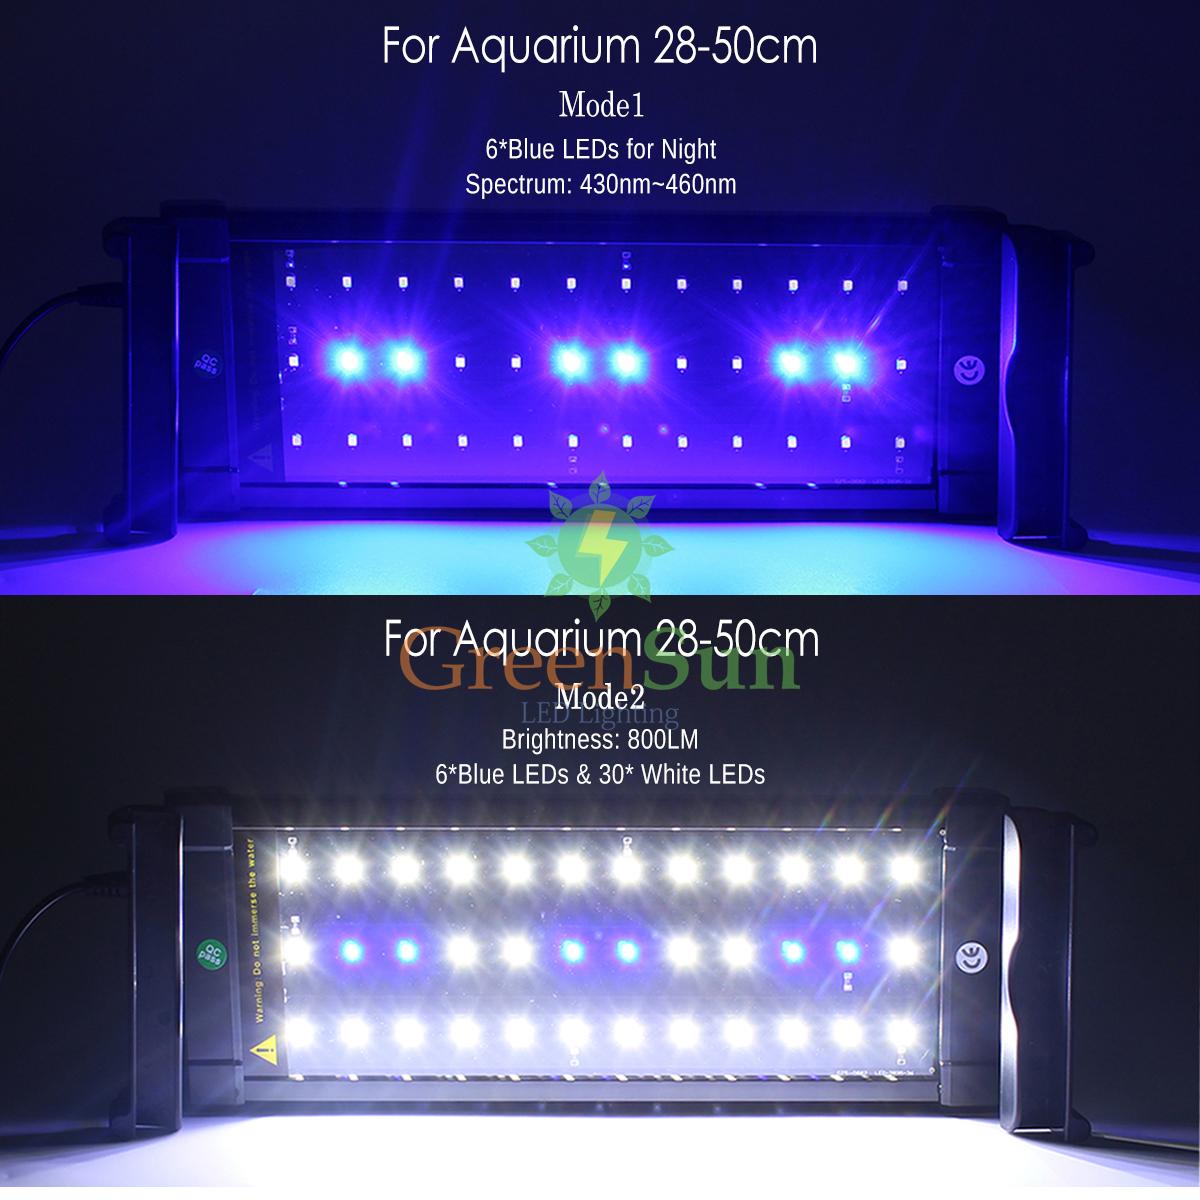 28cm 70cm aquarium beleuchtung led lampe aufsetzleuchte abdeckung klemmleuchte ebay. Black Bedroom Furniture Sets. Home Design Ideas